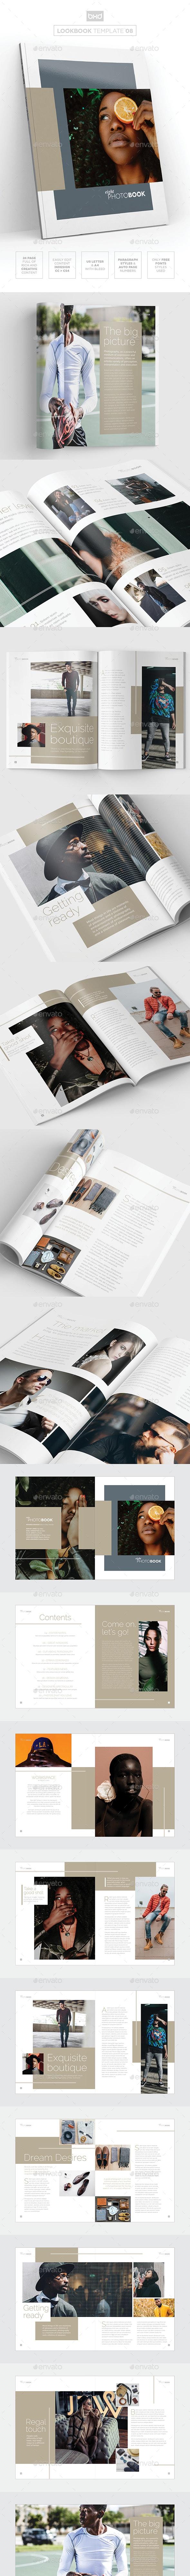 Magazine/Lookbook Template InDesign & Photoshop 08 - Magazines Print Templates